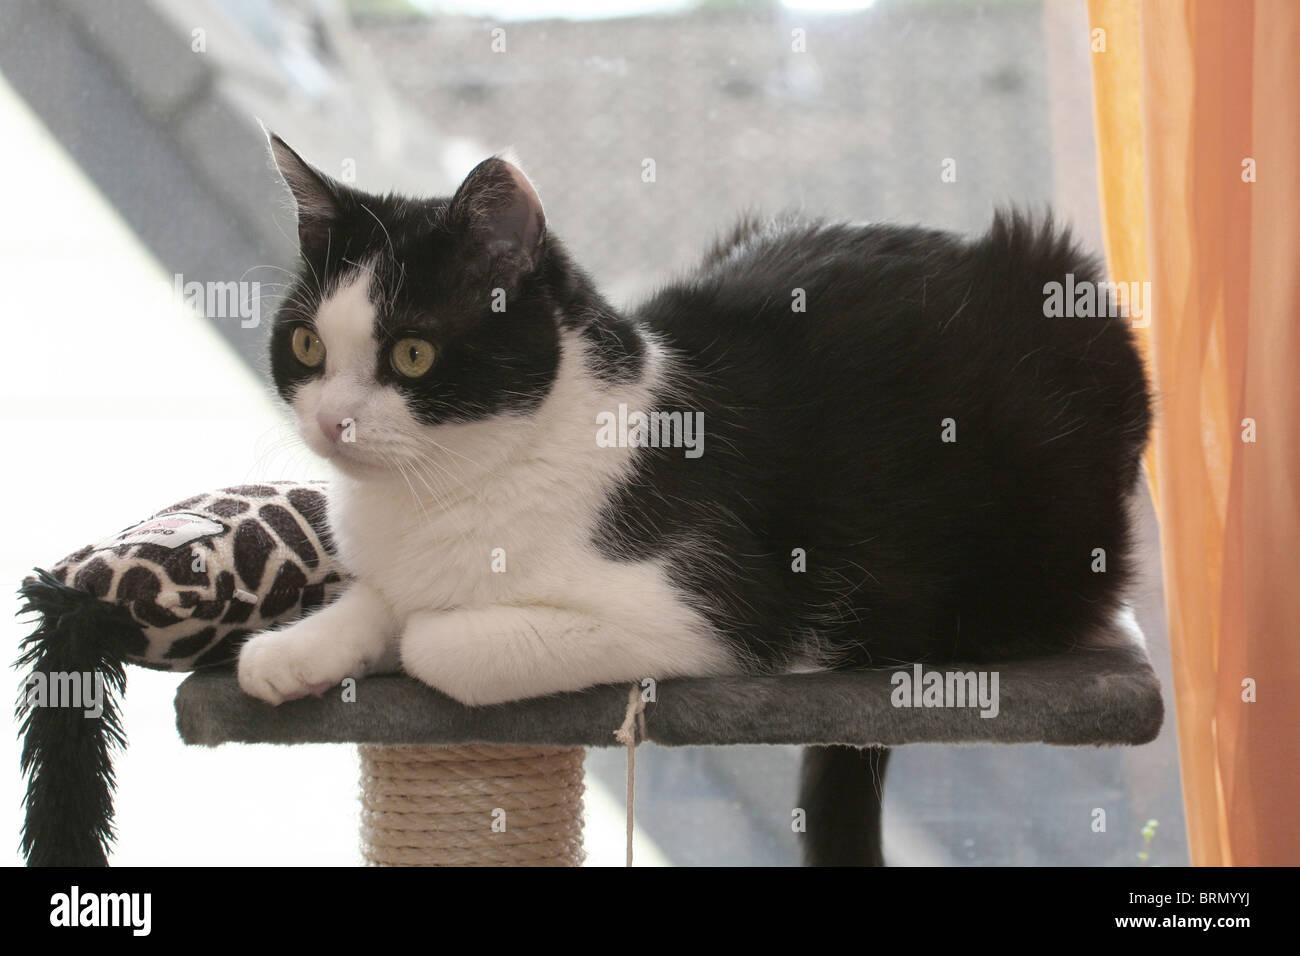 Domestic Cat (Felis silvestris, Felis catus). 11 year old tomcat lying on a scratching post. - Stock Image